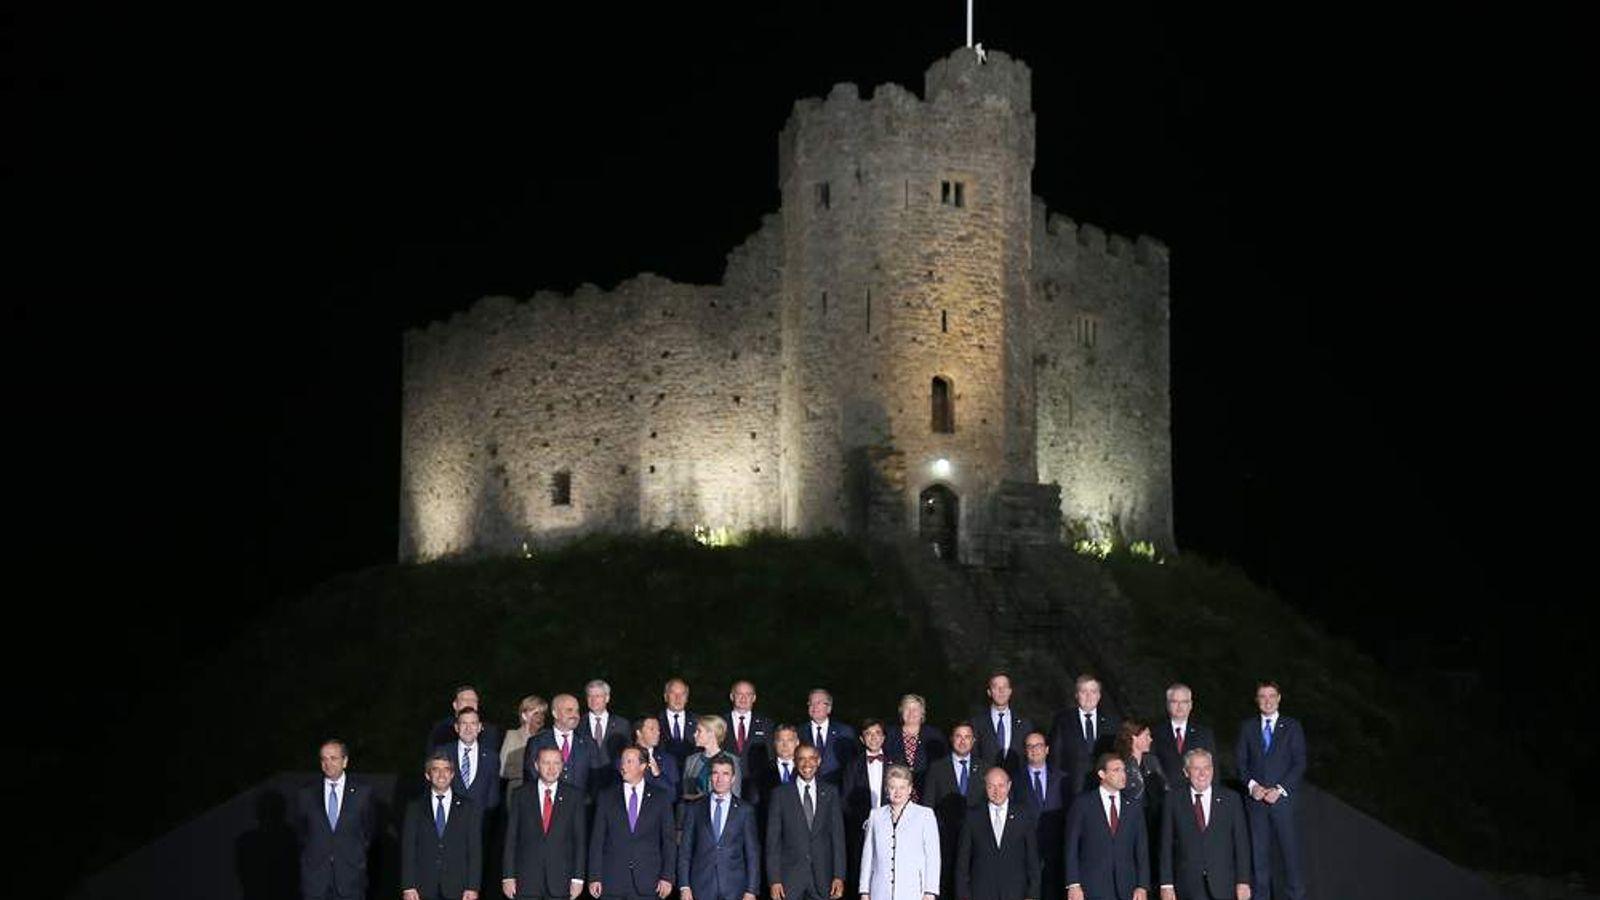 Nato Summit 2014 Family Photo